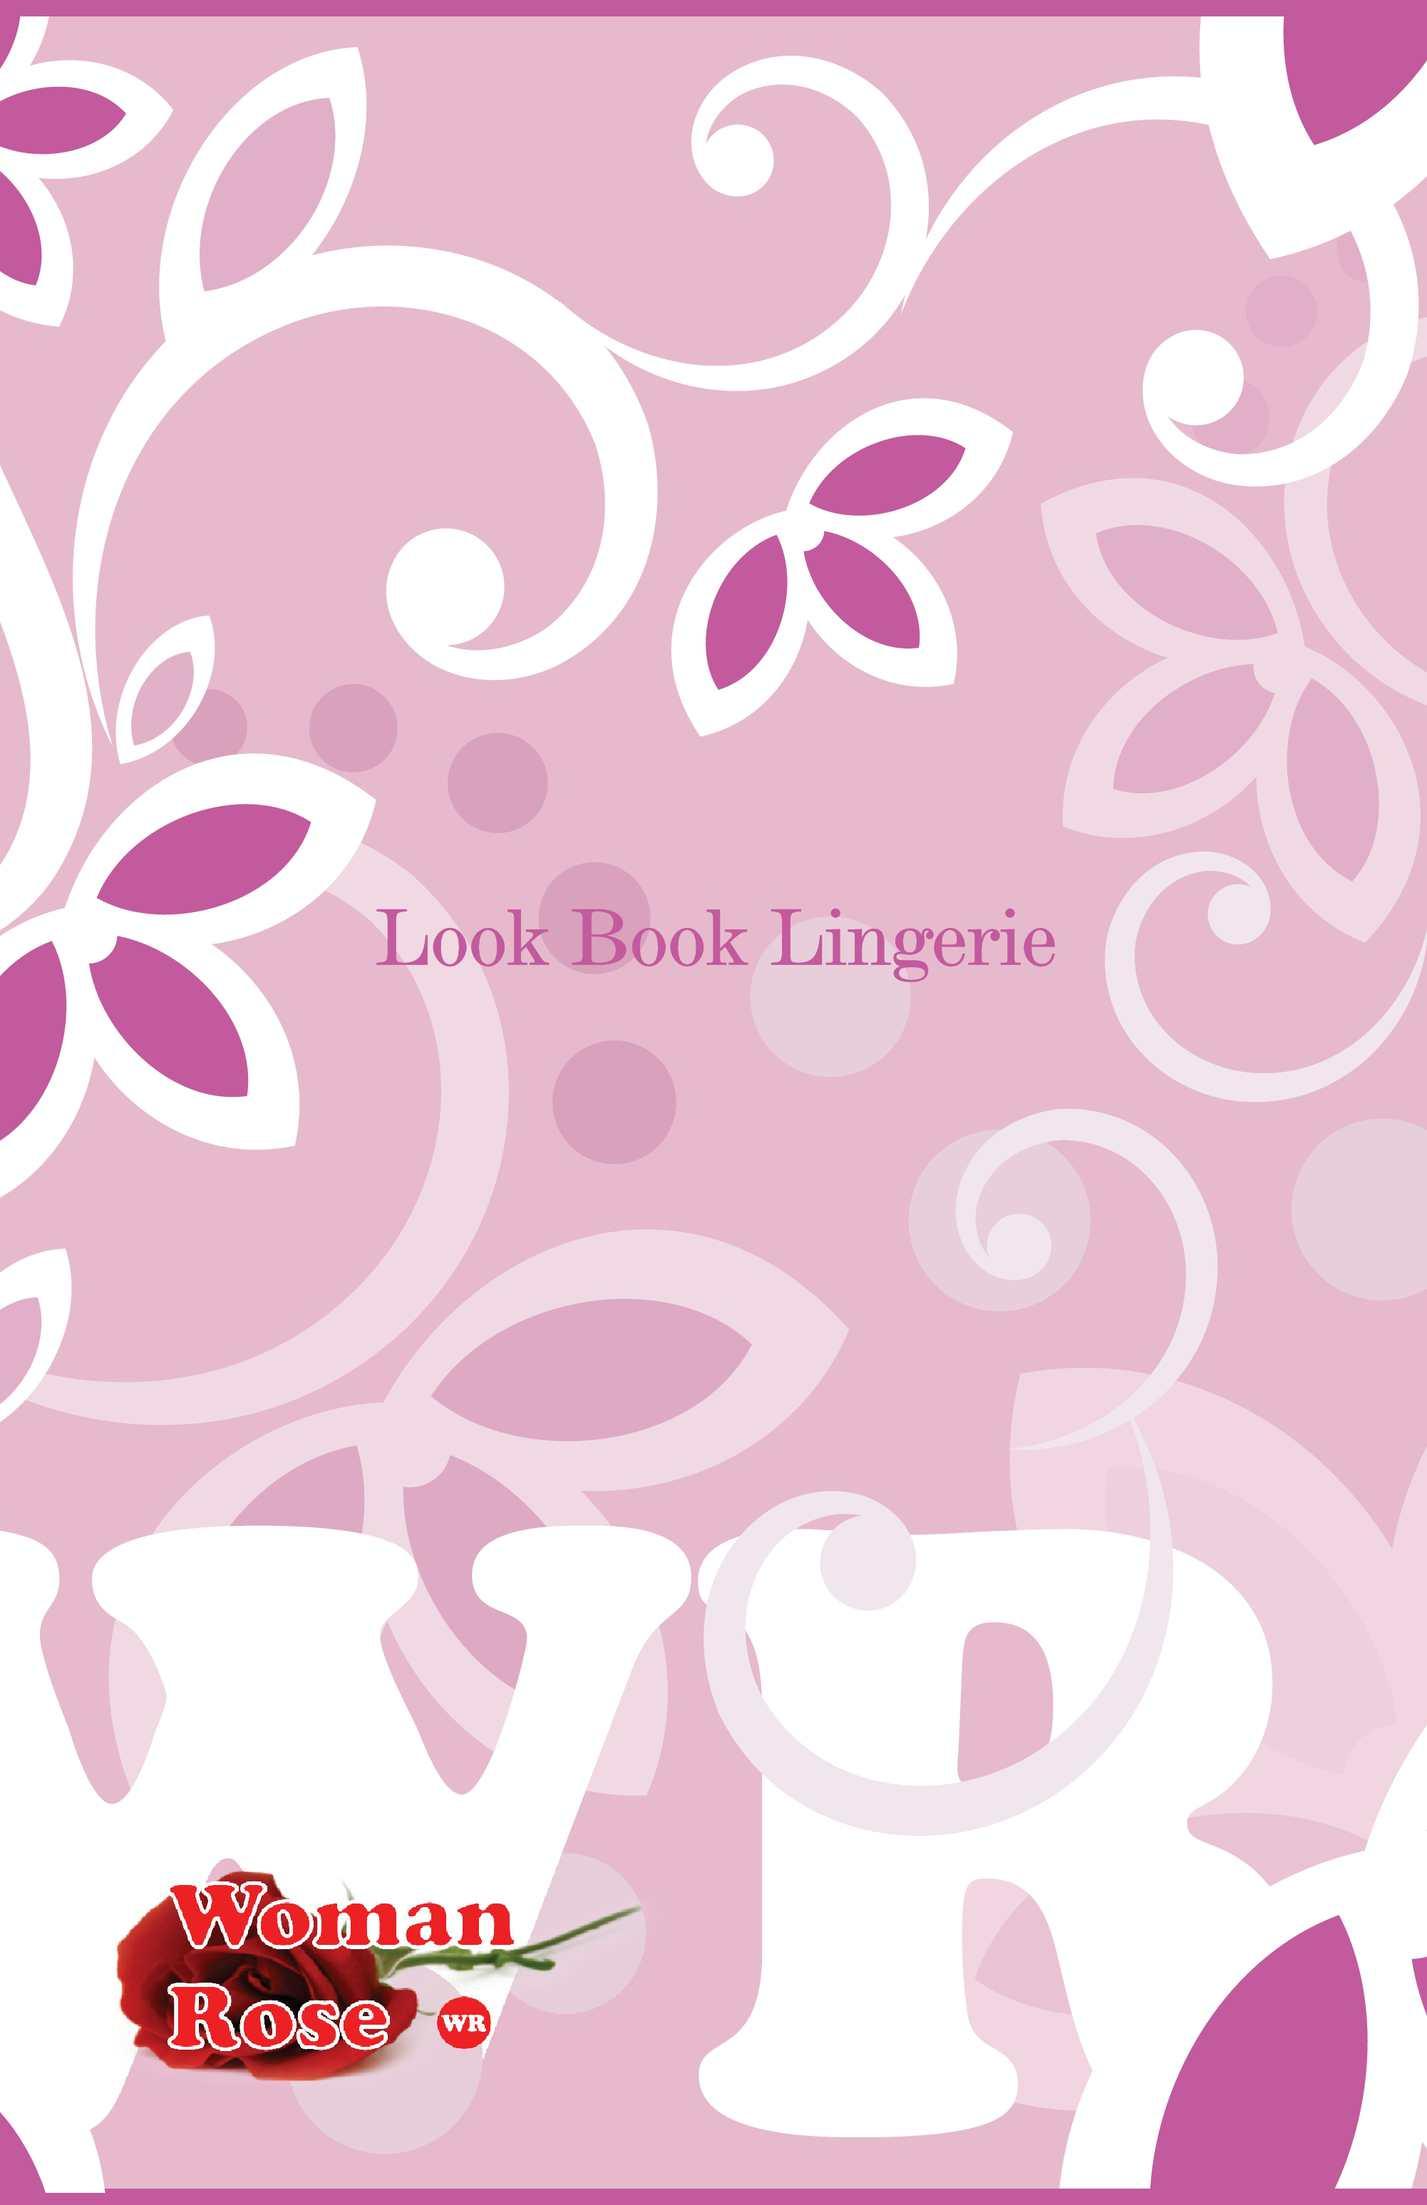 Woman Rose Lingerie - Look Book